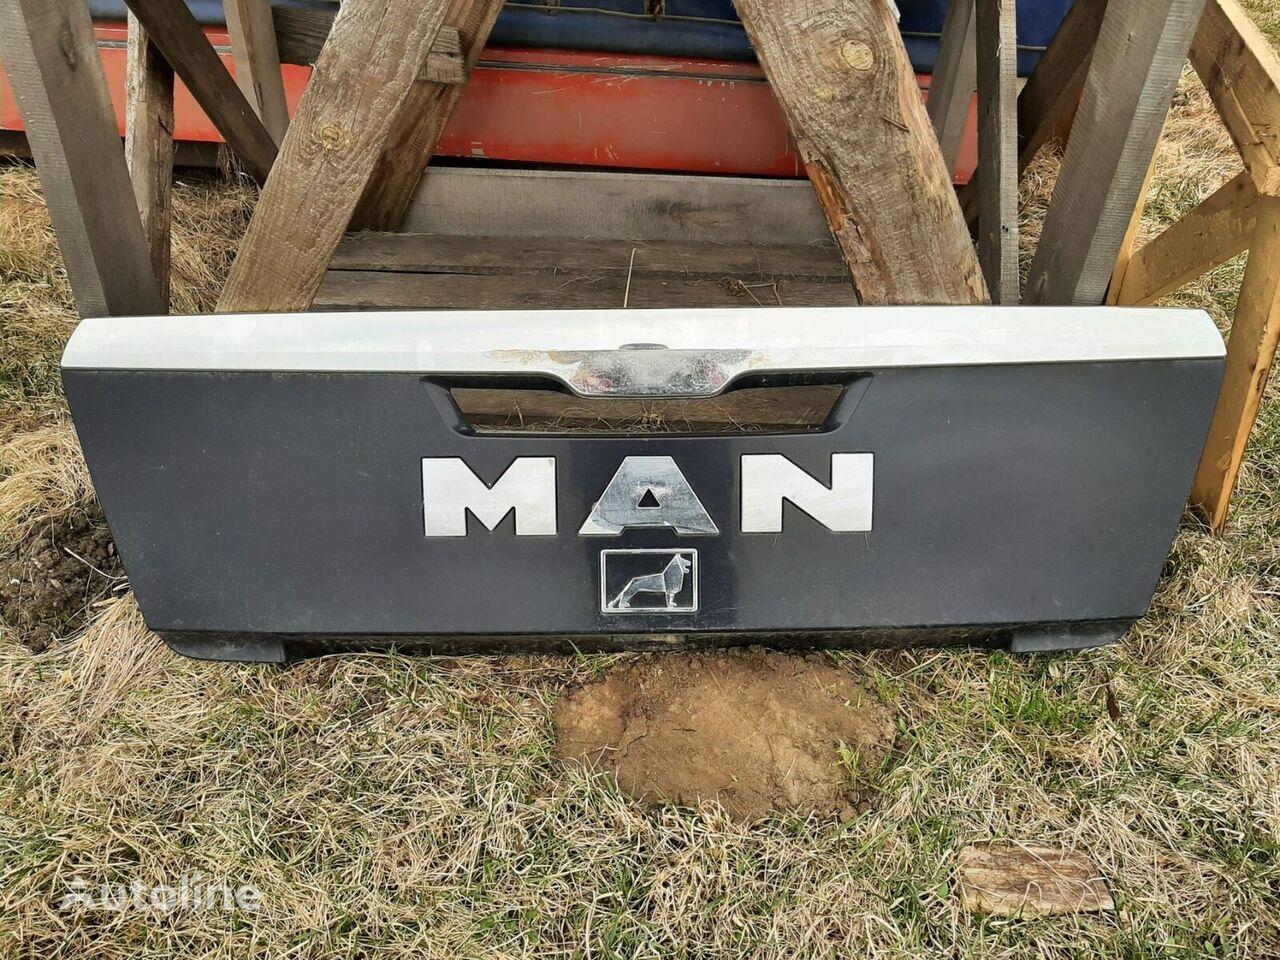 (81611506066) radiator grille for MAN truck